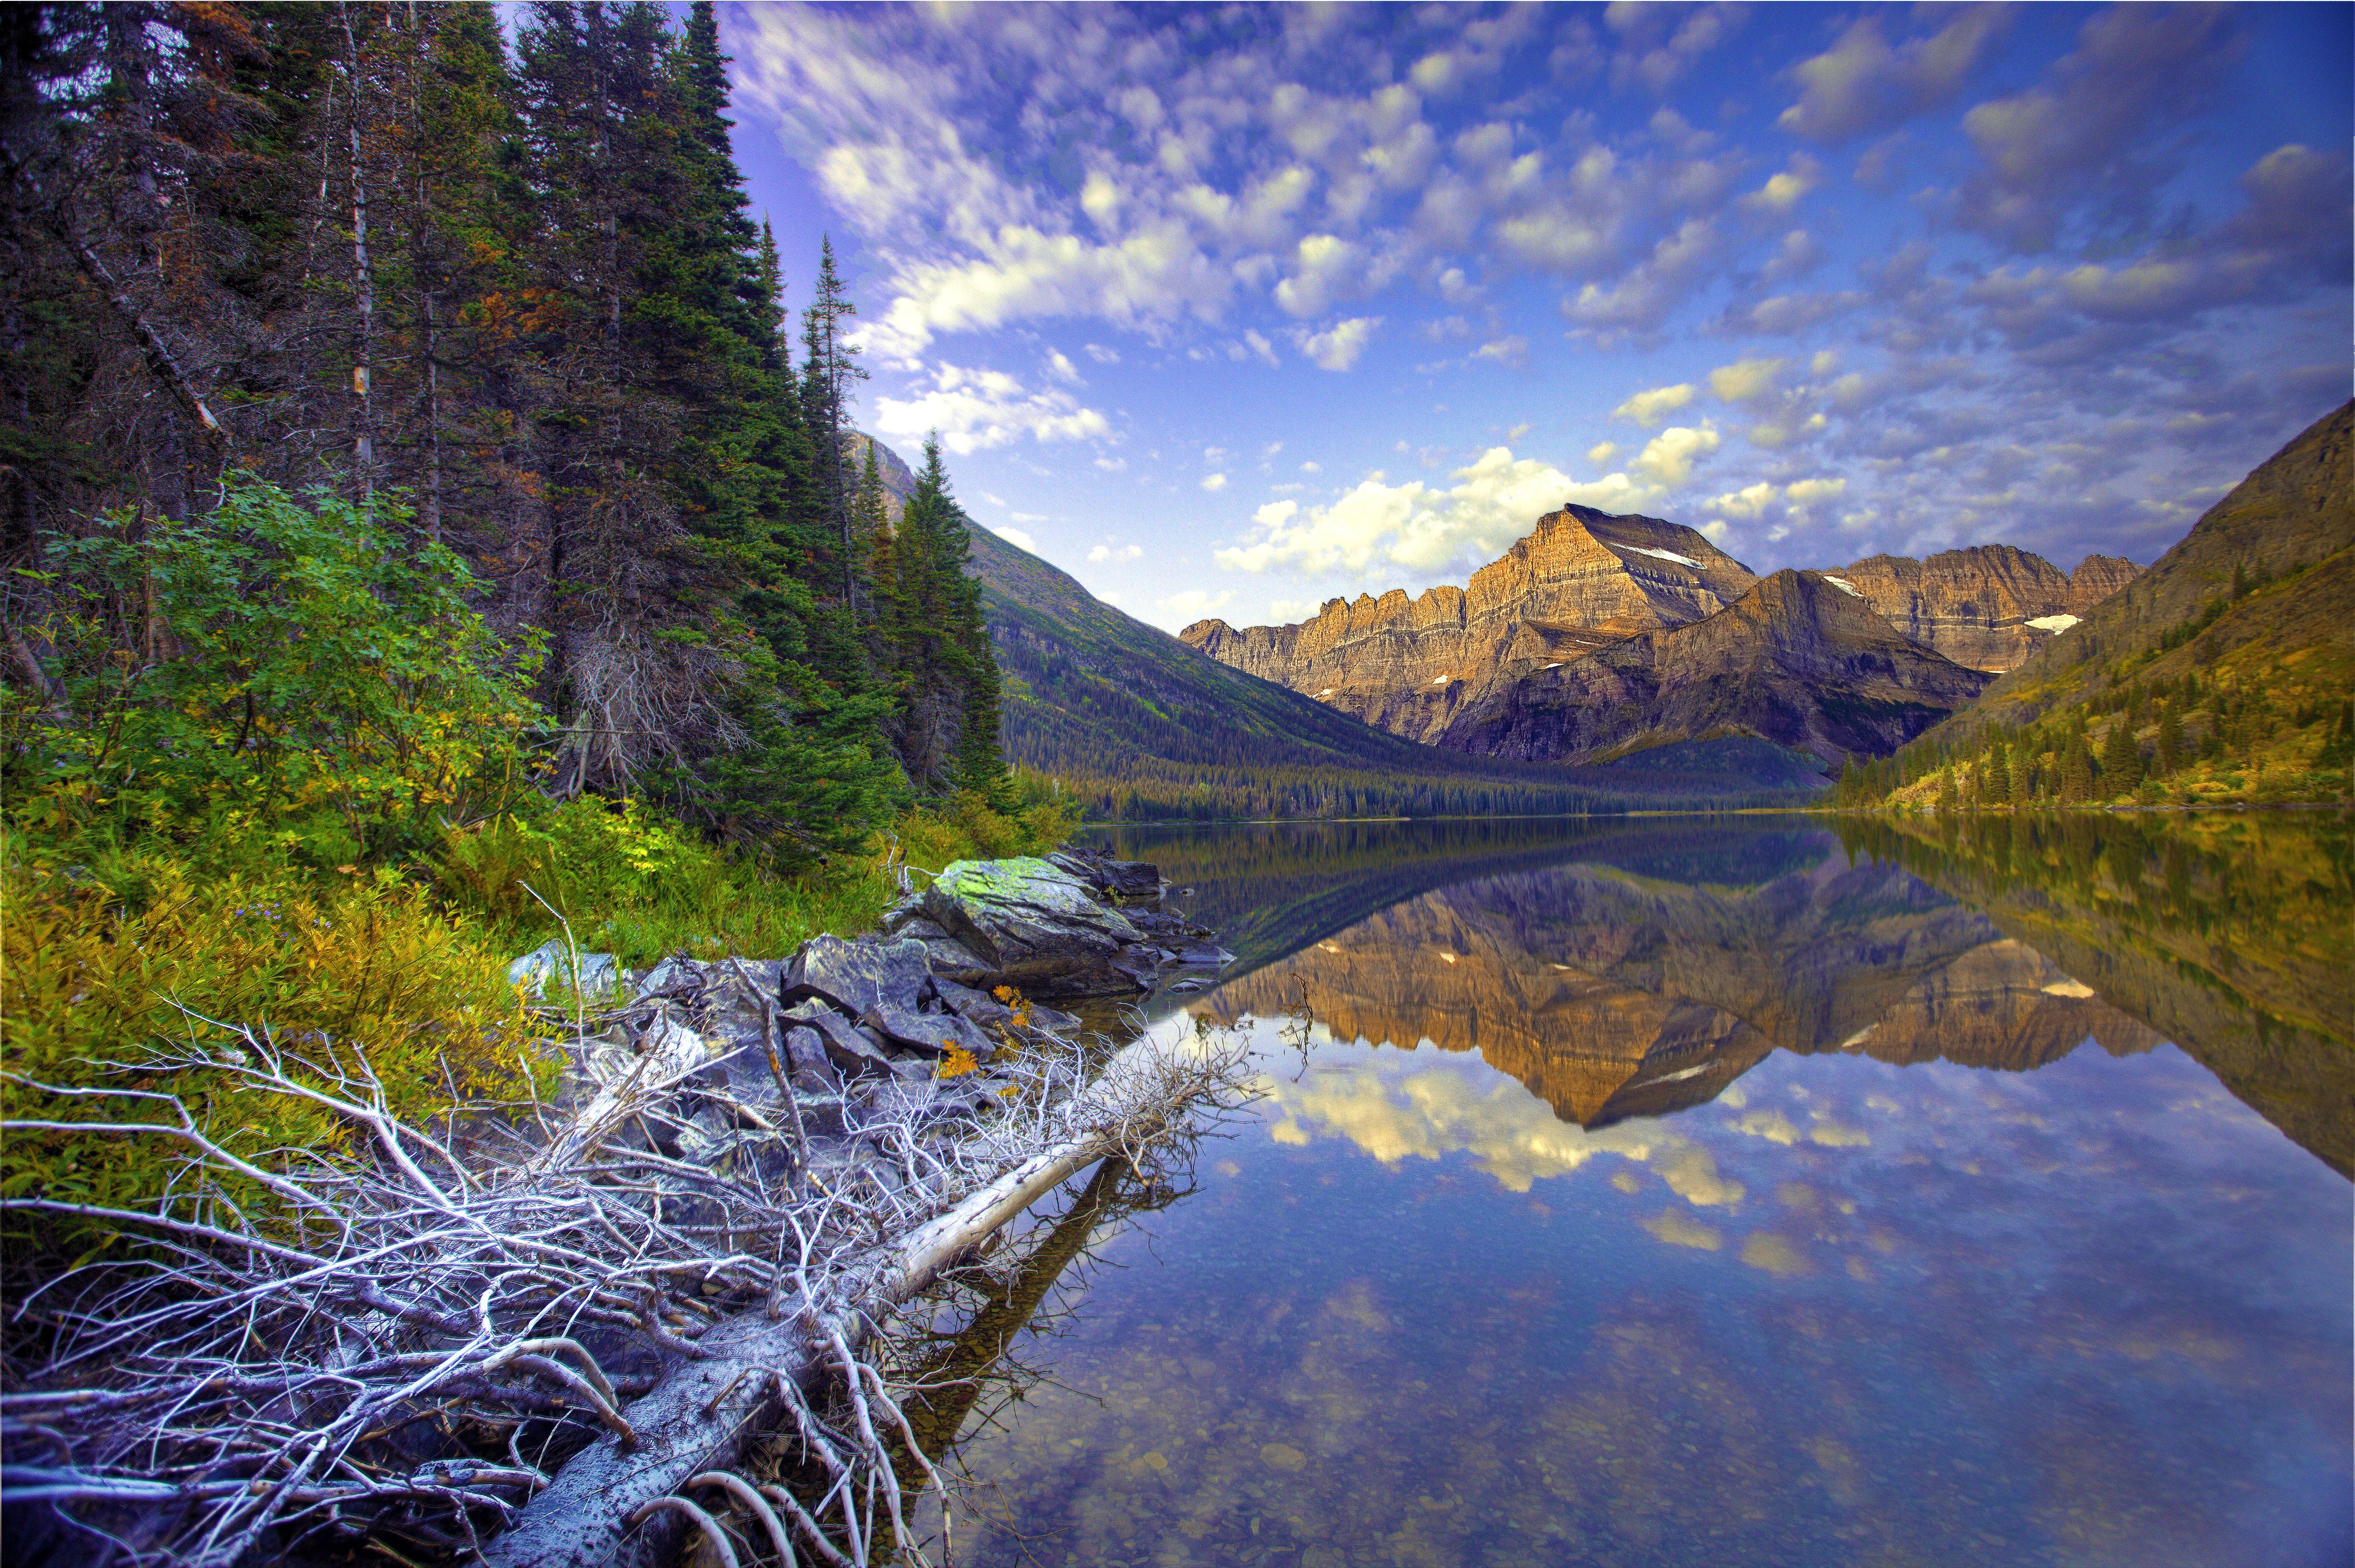 Lake josephine montana 5k retina ultra hd wallpaper for Sfondi hd natura